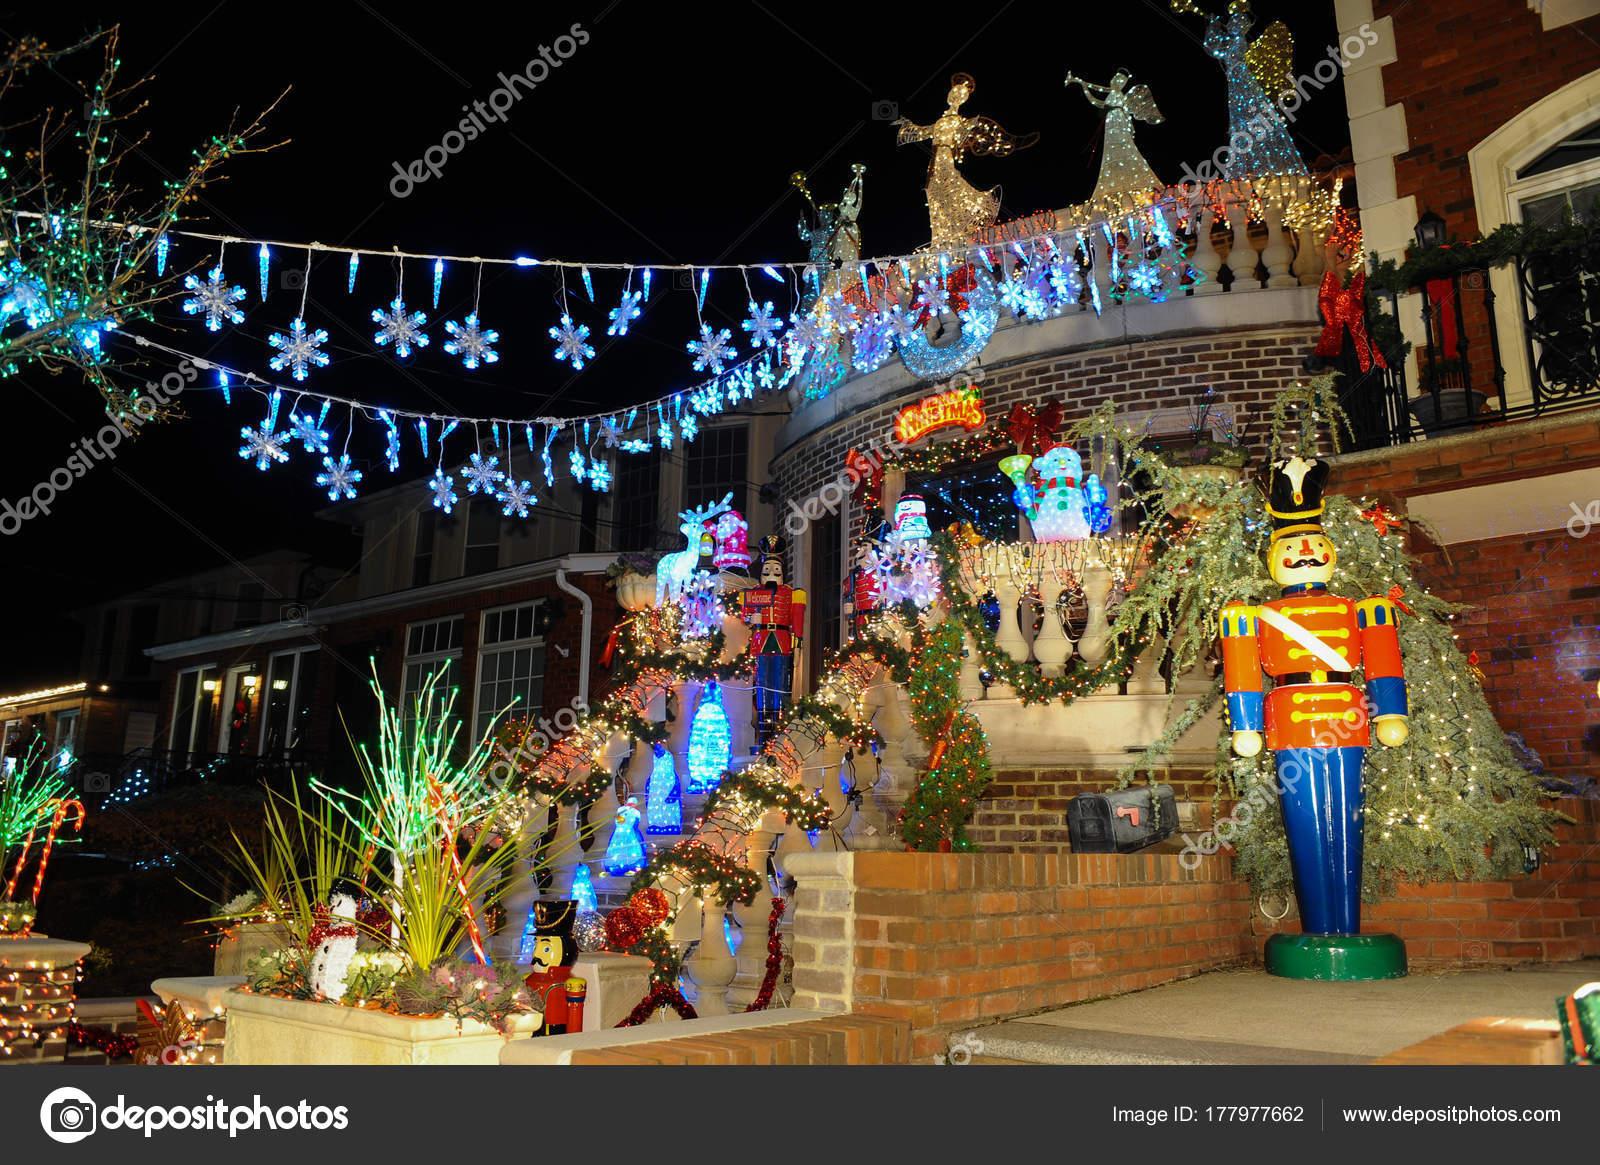 Dyker Heights Christmas Lights.Brooklyn New York December 2017 Dyker Heights Christmas